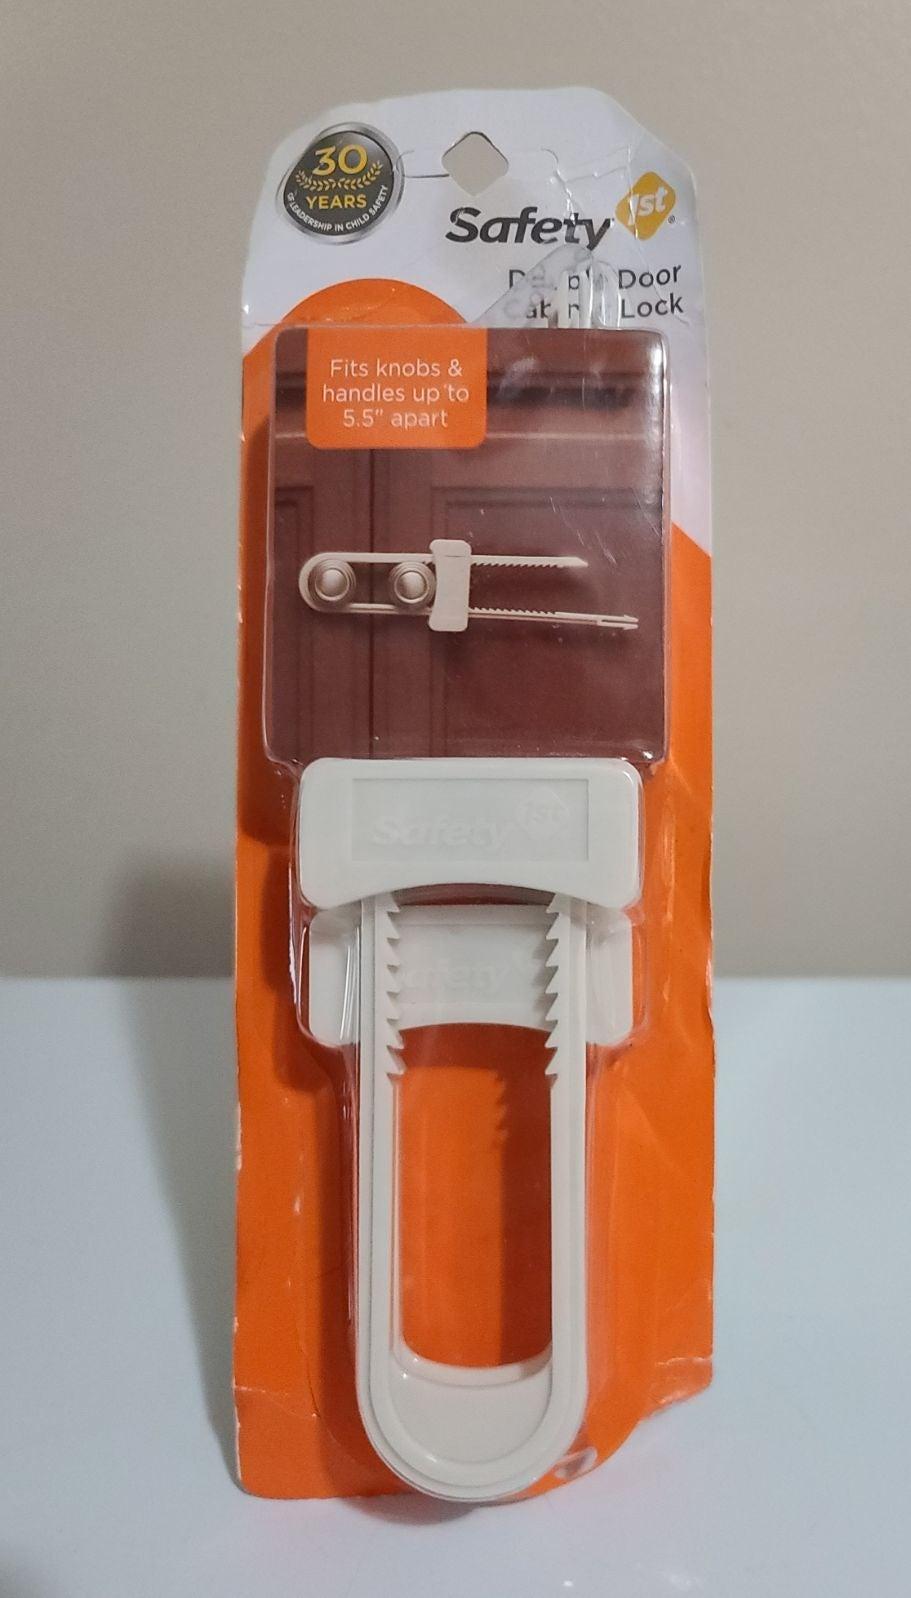 Child proof locks